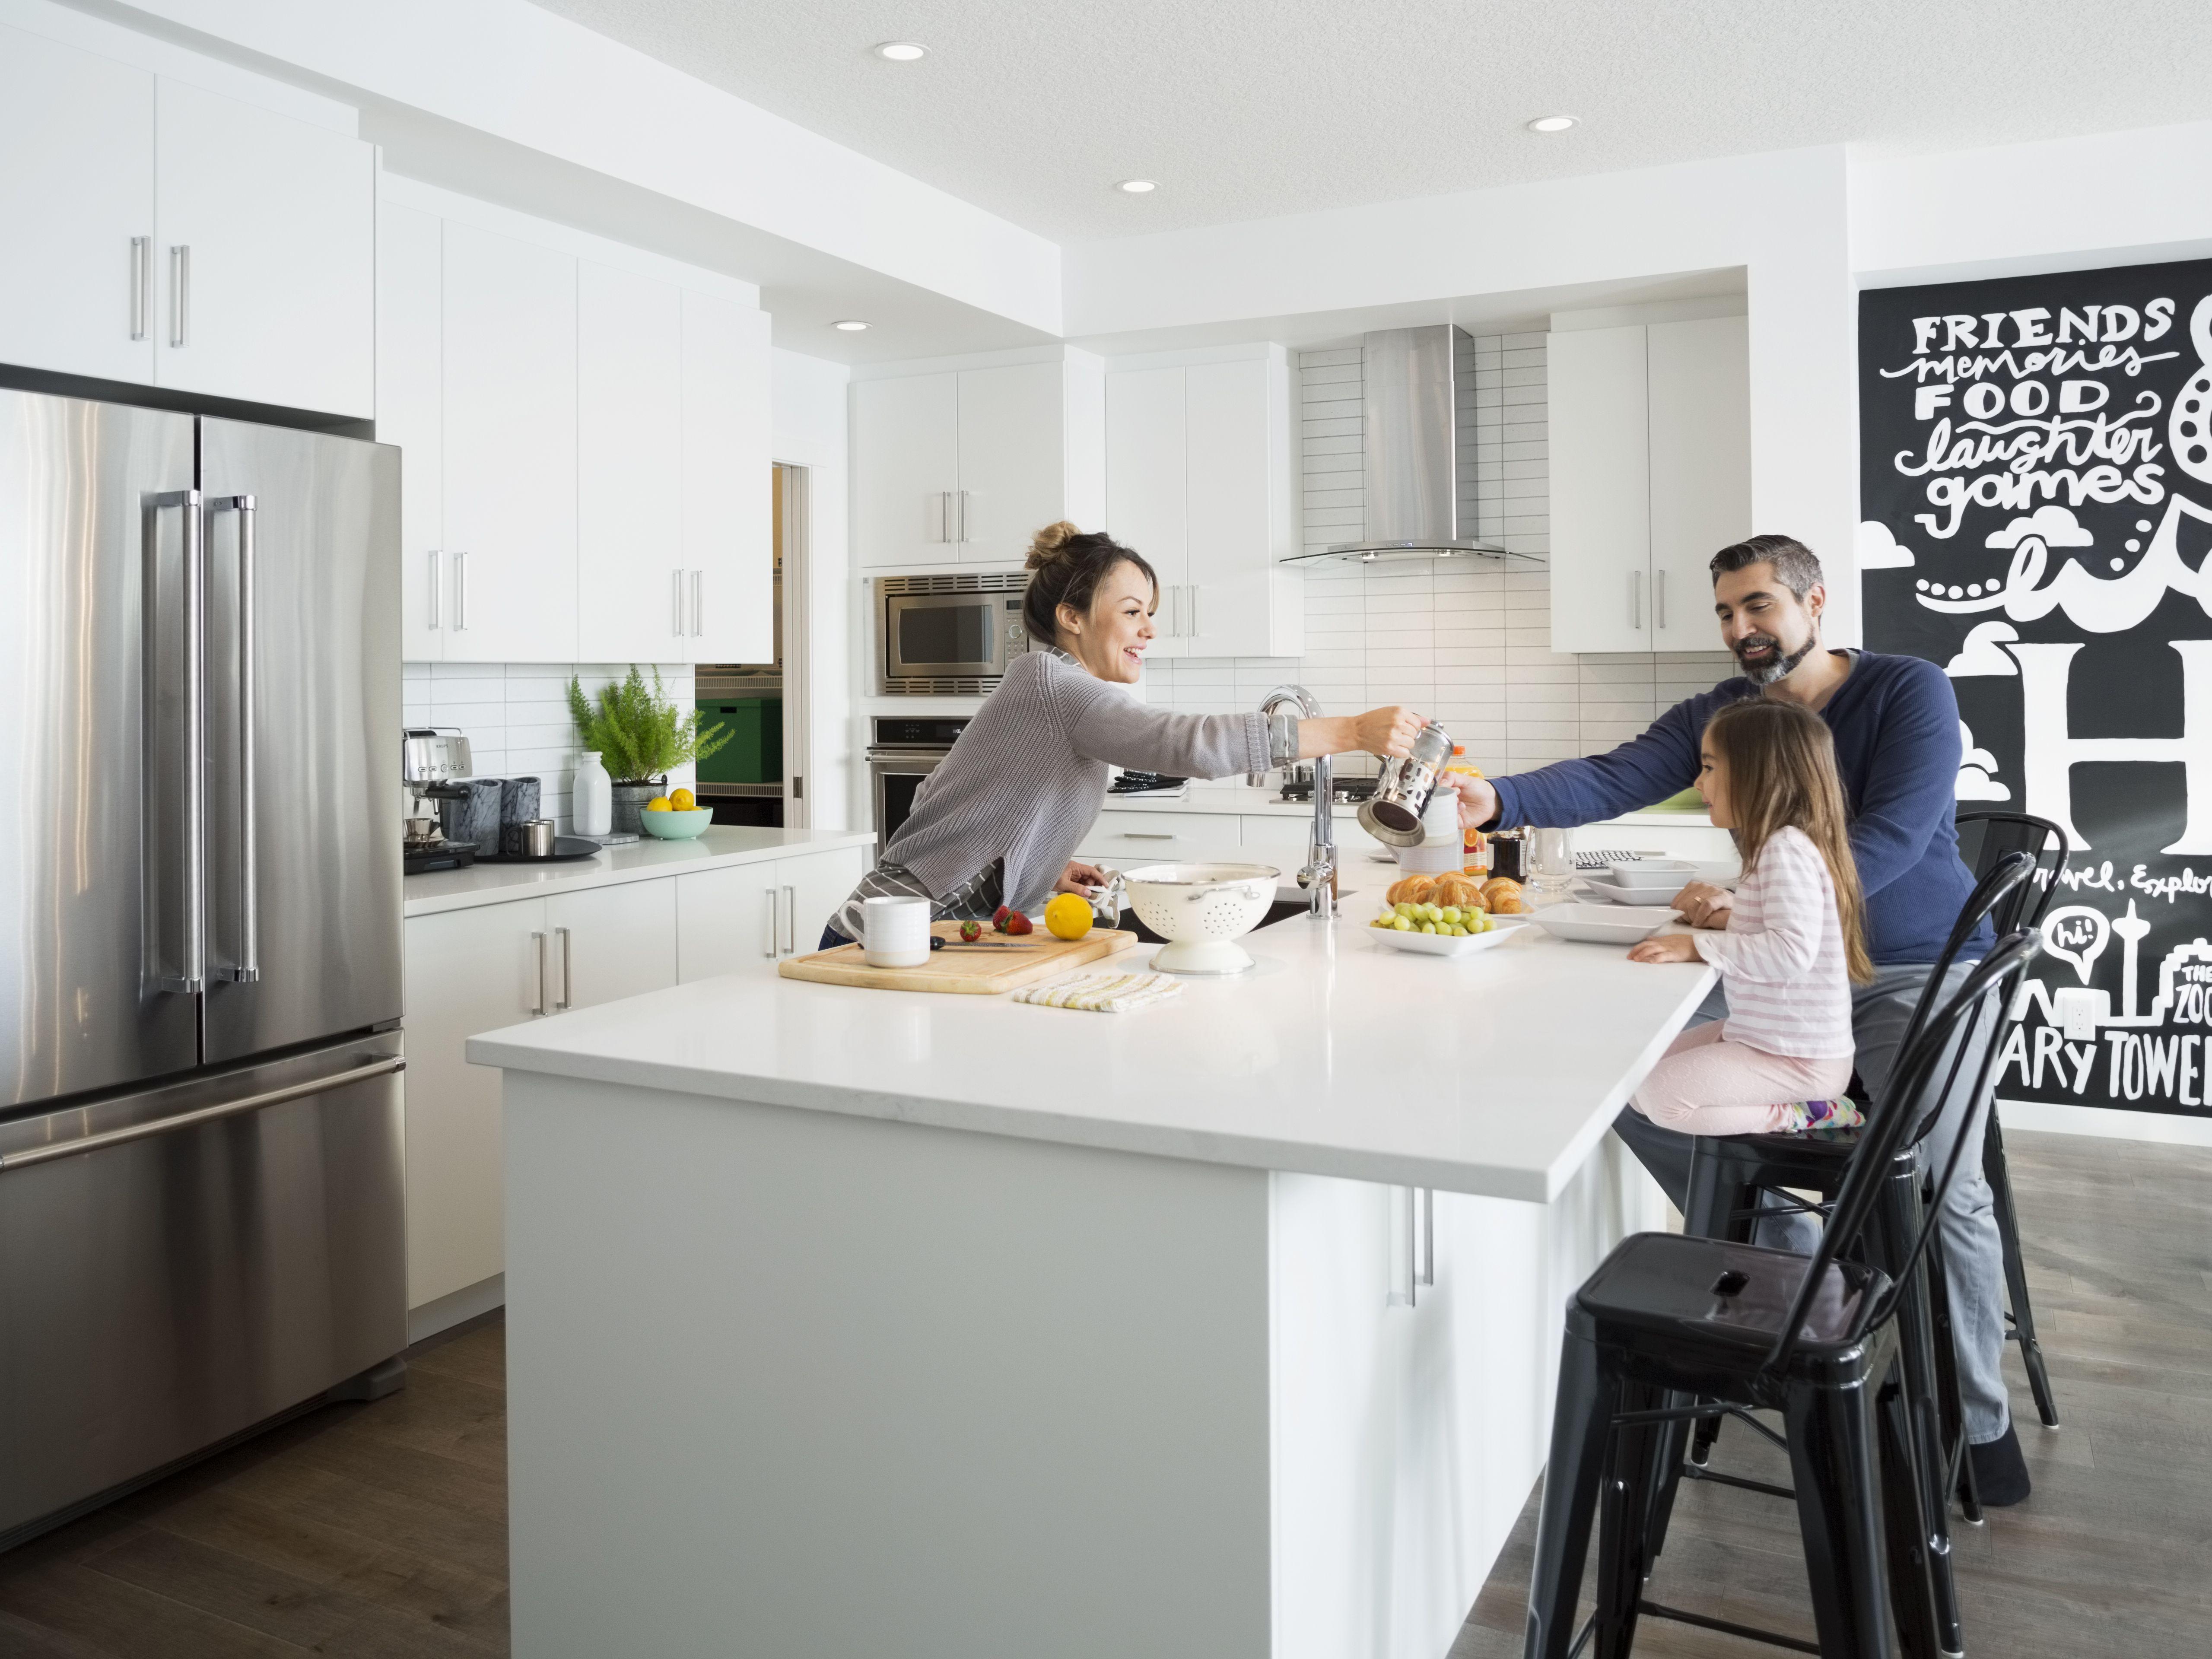 The 7 Best Kitchen Islands of 2019